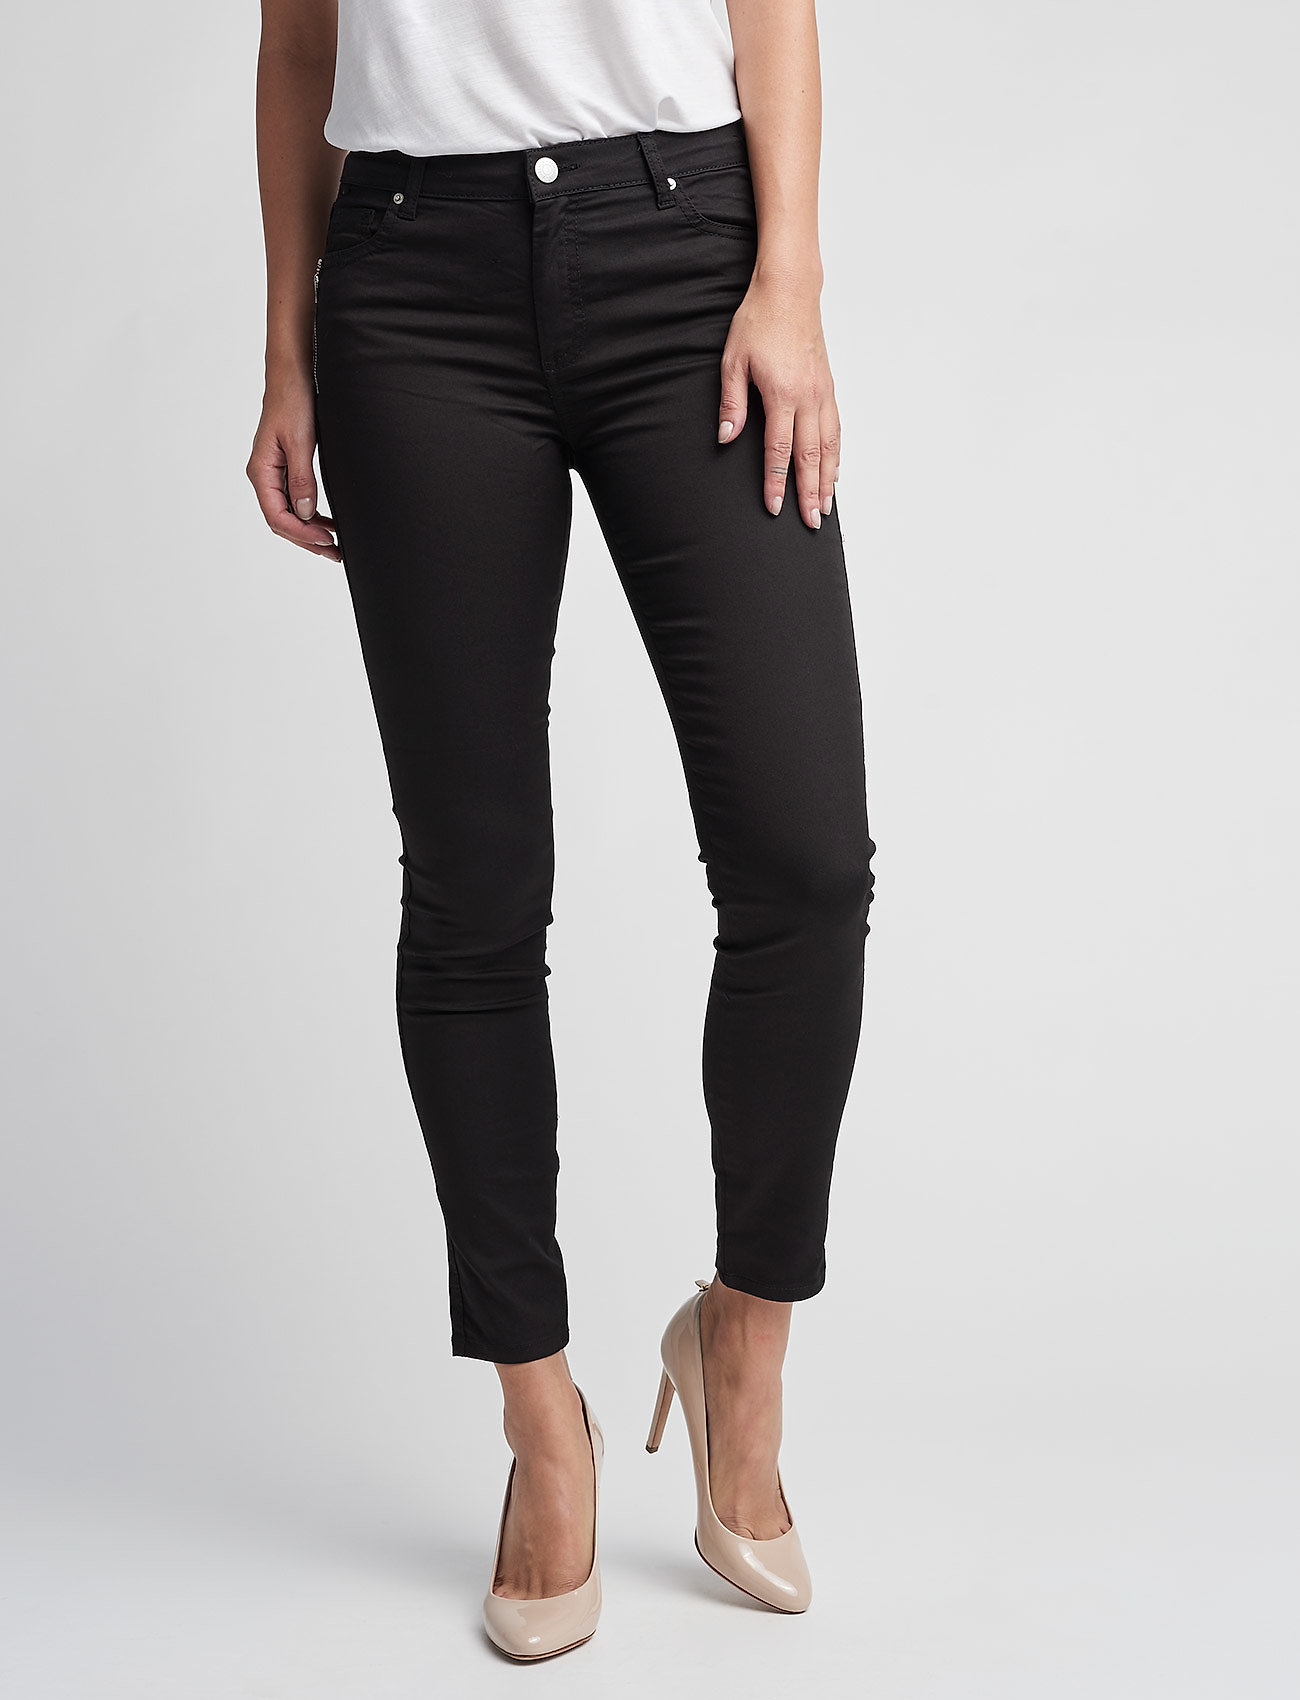 FIVEUNITS - Penelope 266 Zip, Black Line, Jeans - skinny farkut - black line - 0